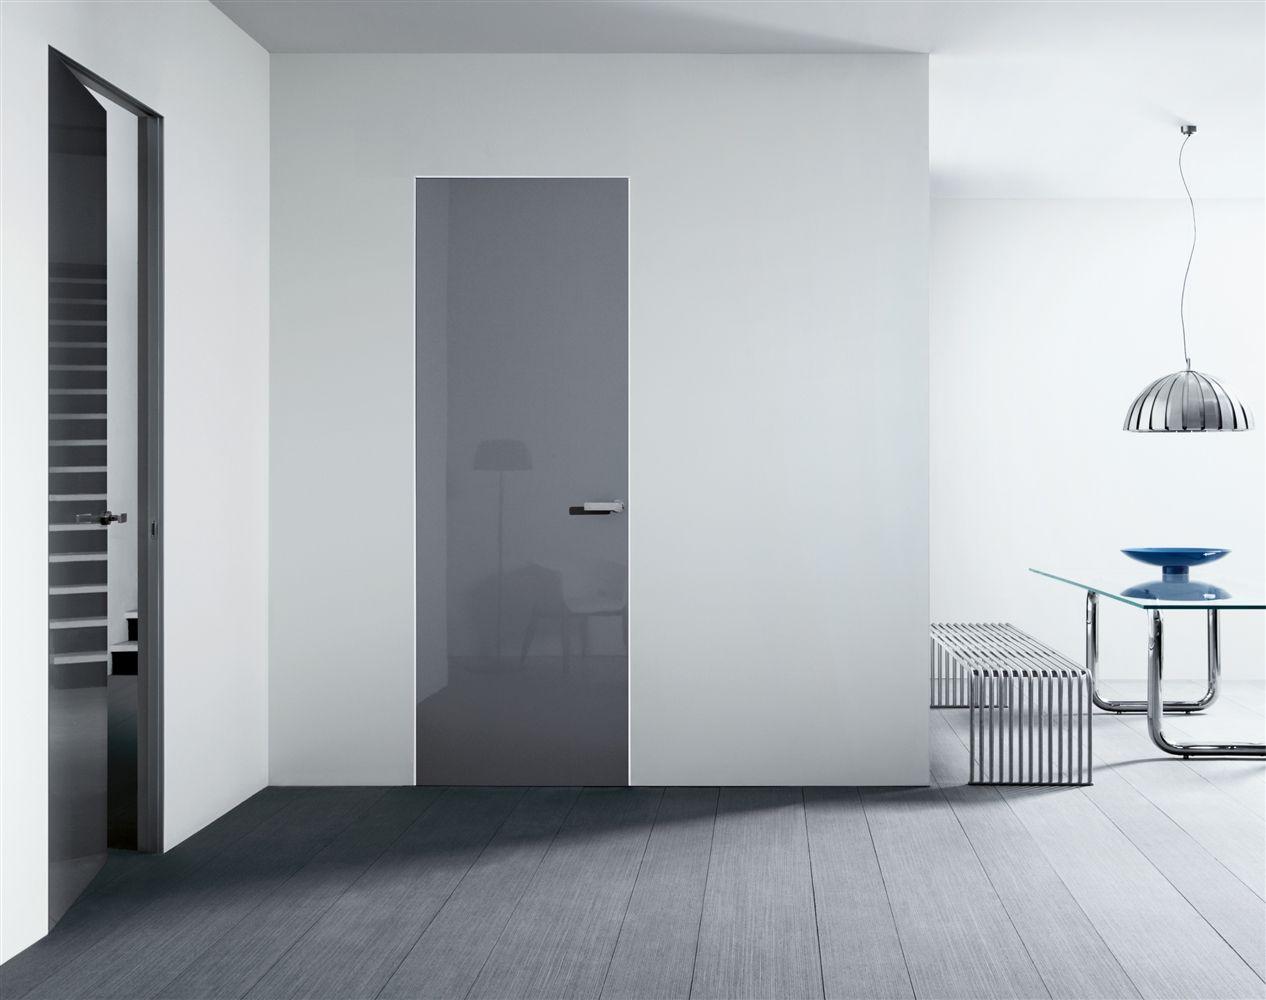 Pin di dcmetromodern su Contemporary Interior Doors nel 2019 | Porte ...